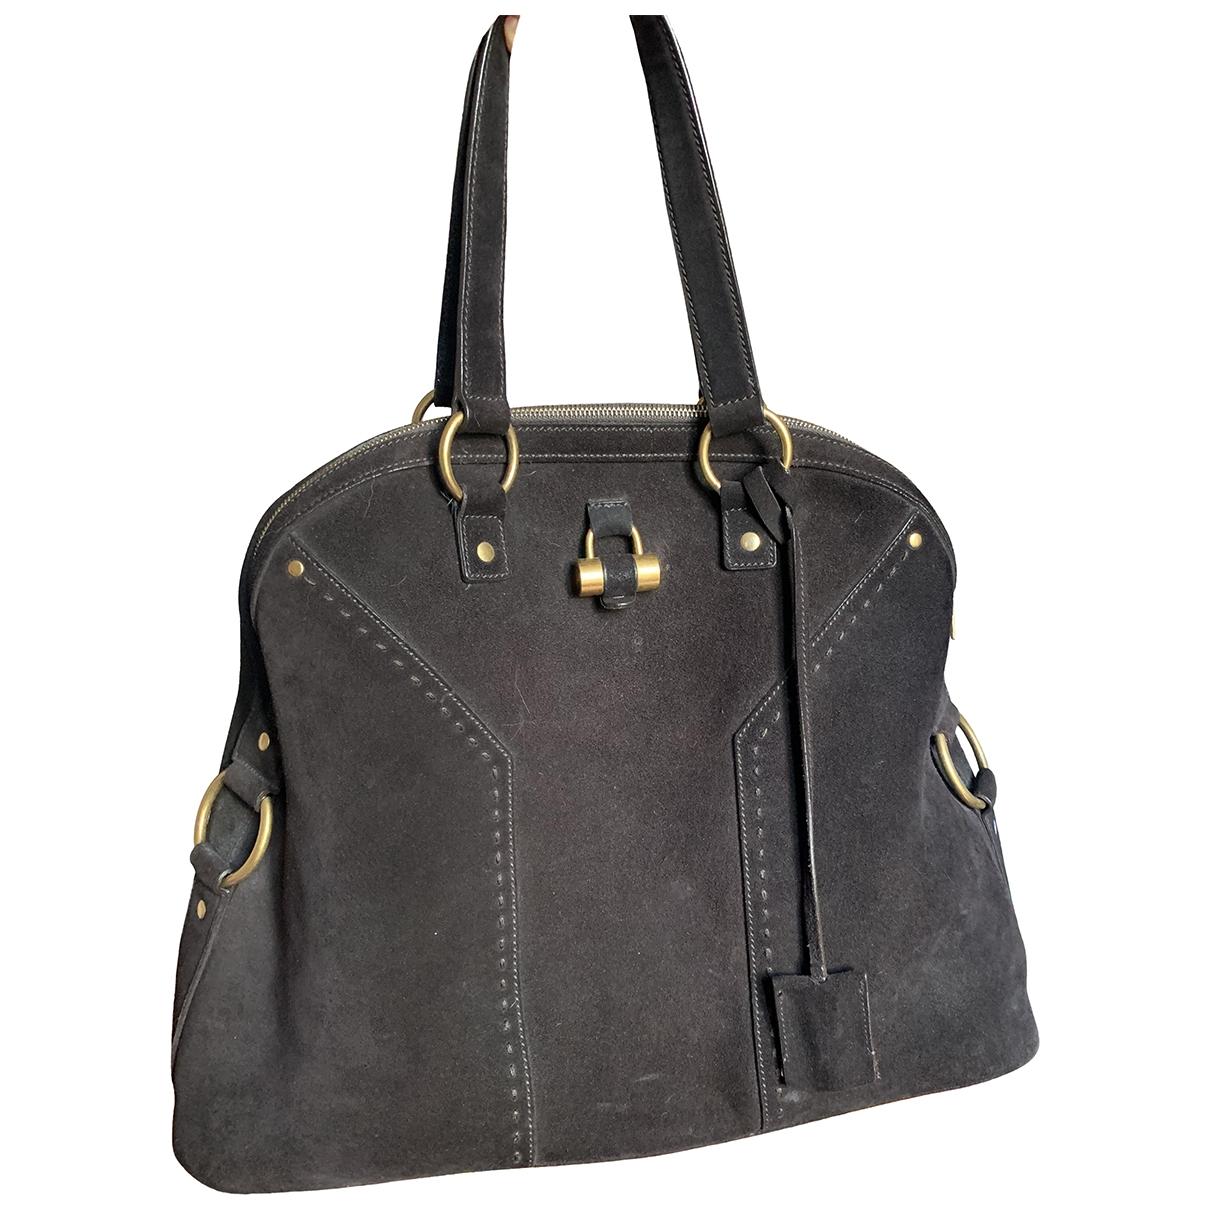 Yves Saint Laurent Muse Handtasche in  Braun Veloursleder